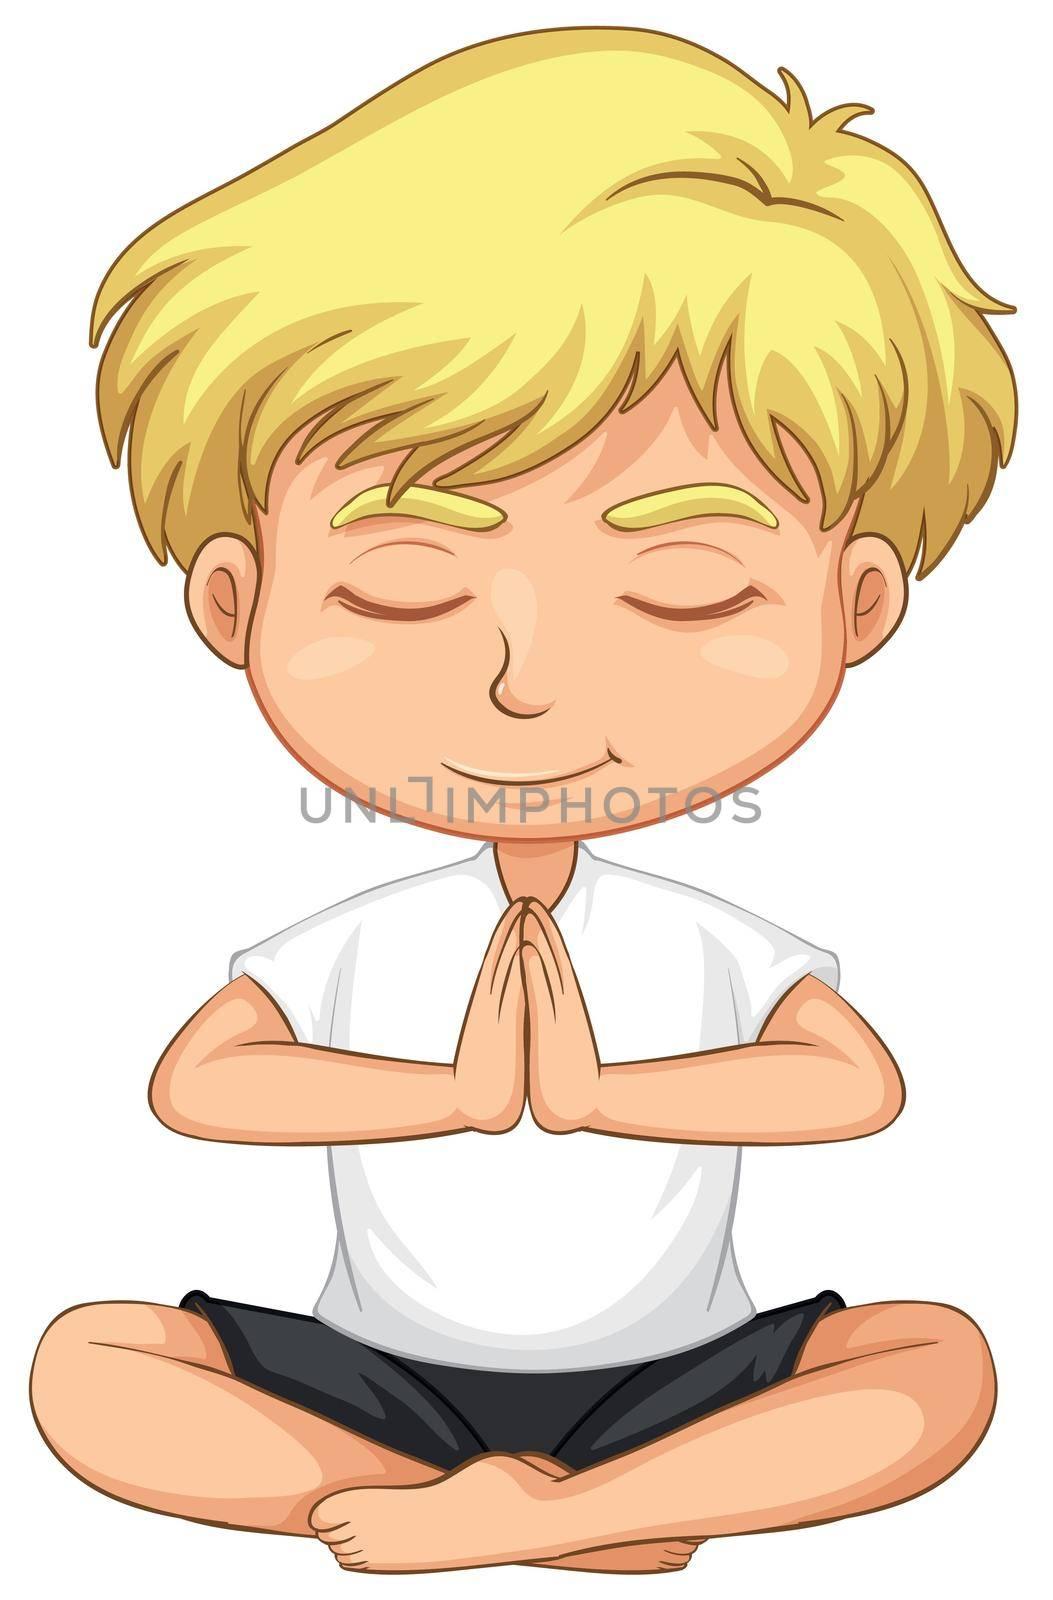 Happy boy yoga pose illustration